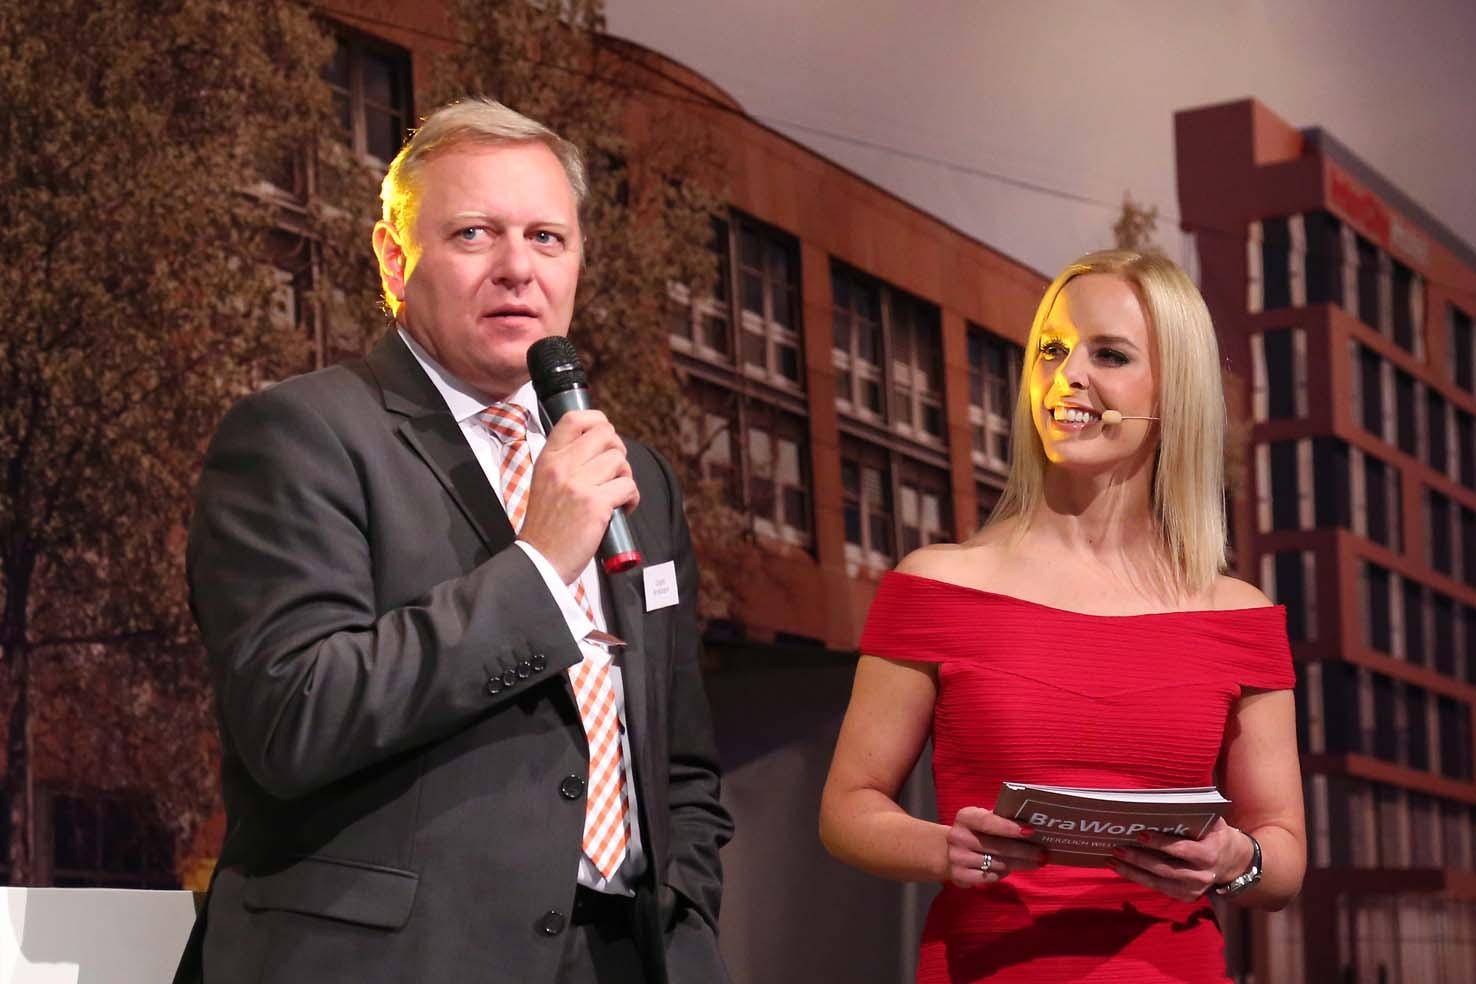 1 - BraWoPark - Dirk Wink-Hartmann